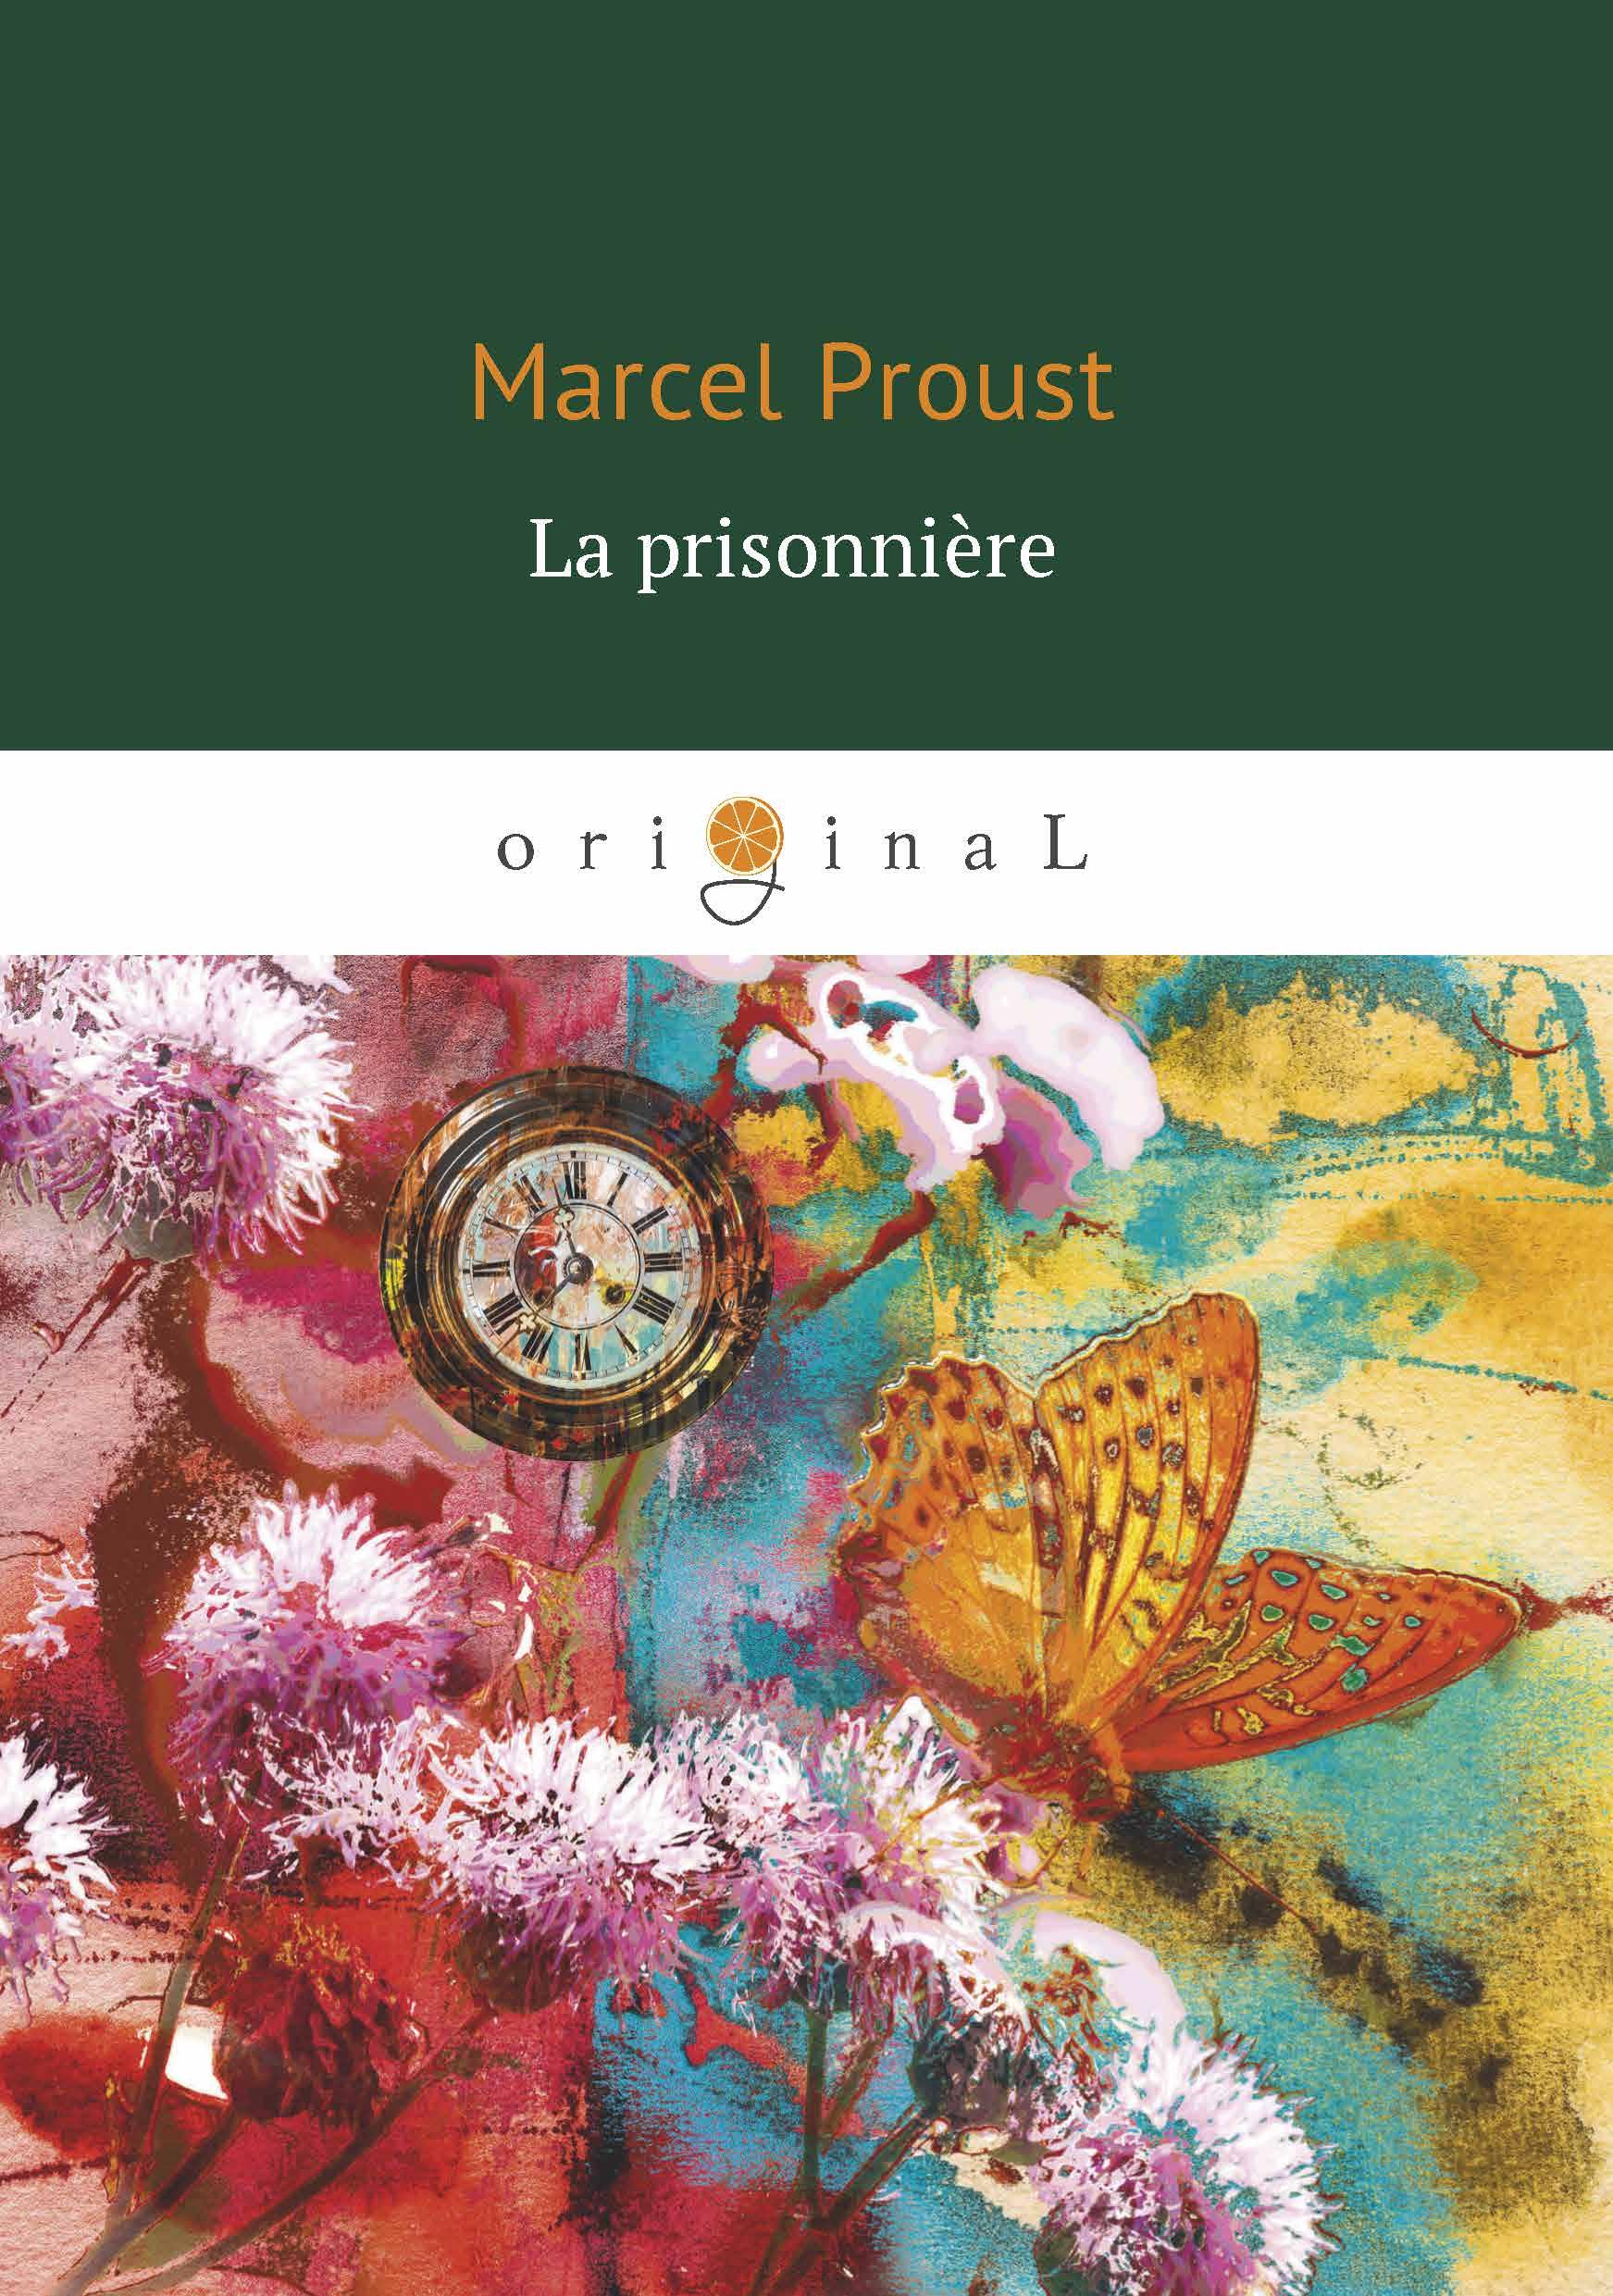 Marcel Proust La prisonniere marcel proust eine liebe swanns